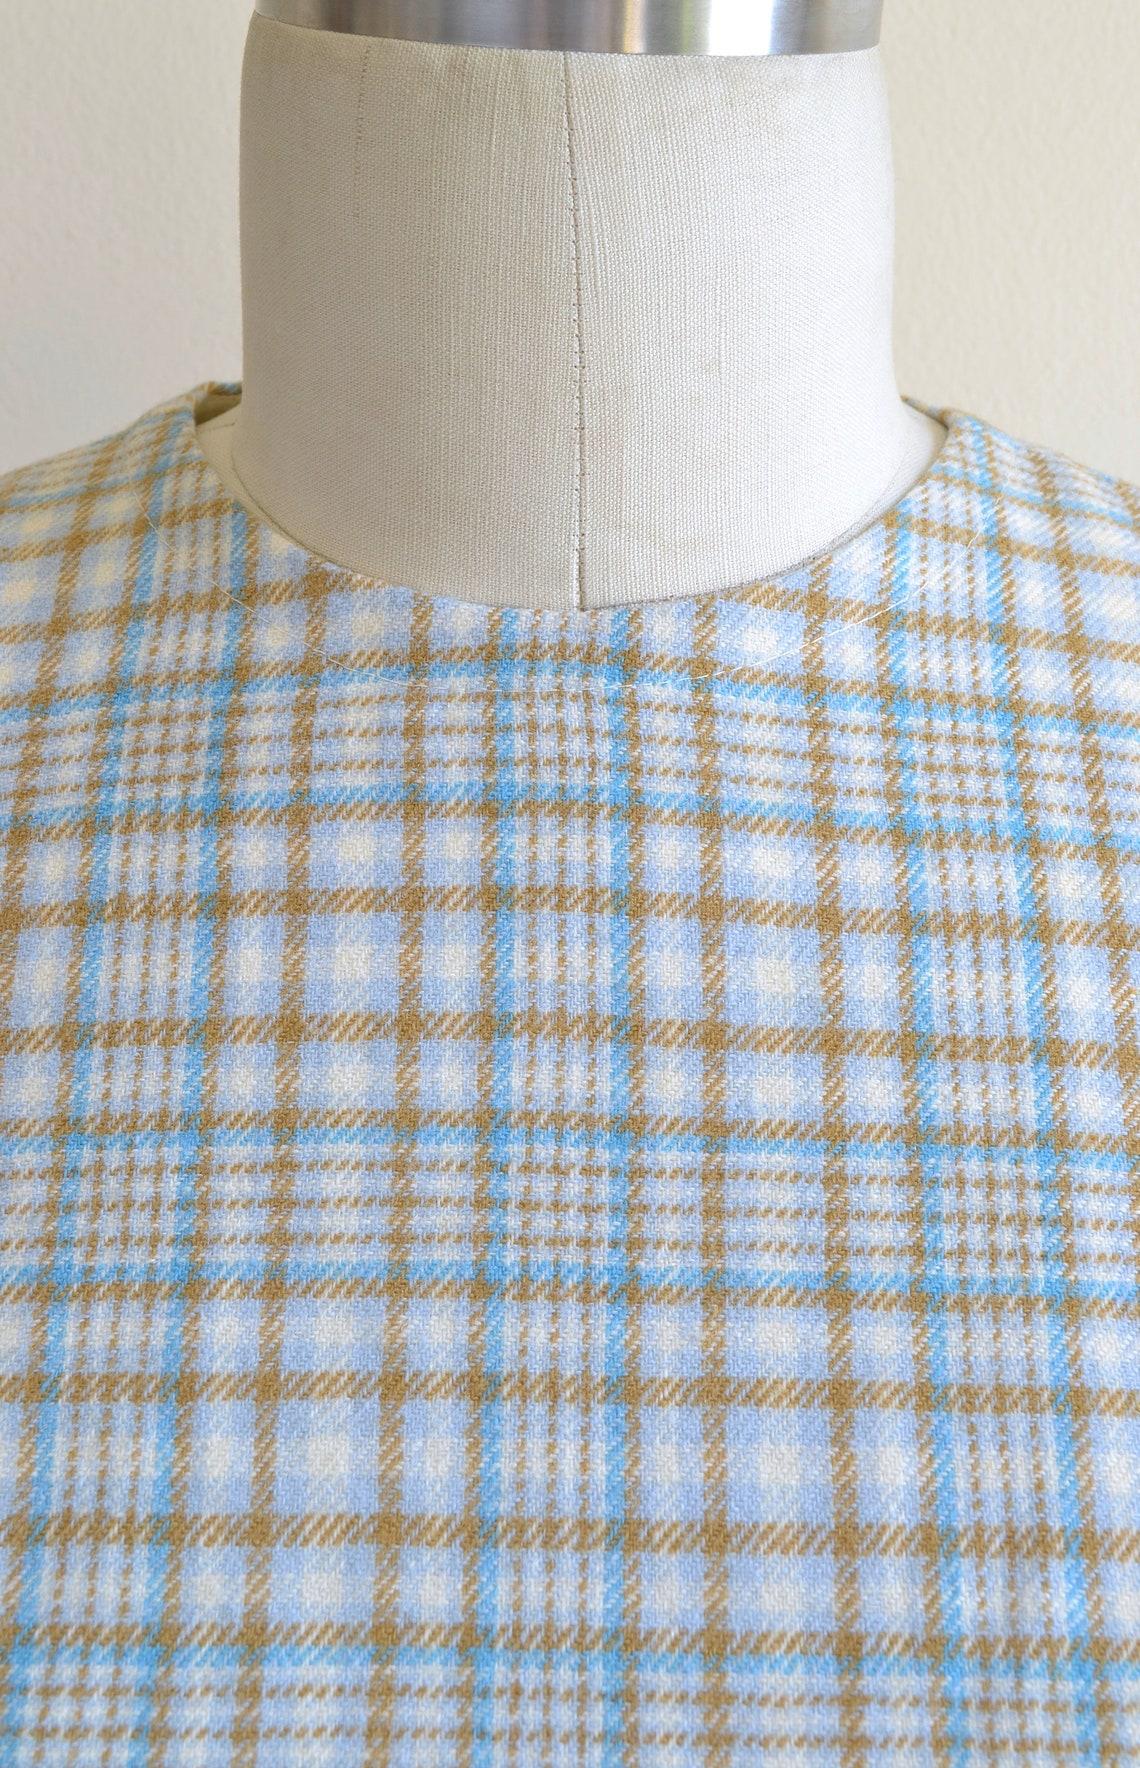 Vintage 1970s  'Zephyr'  Wool Sheath Dress in a